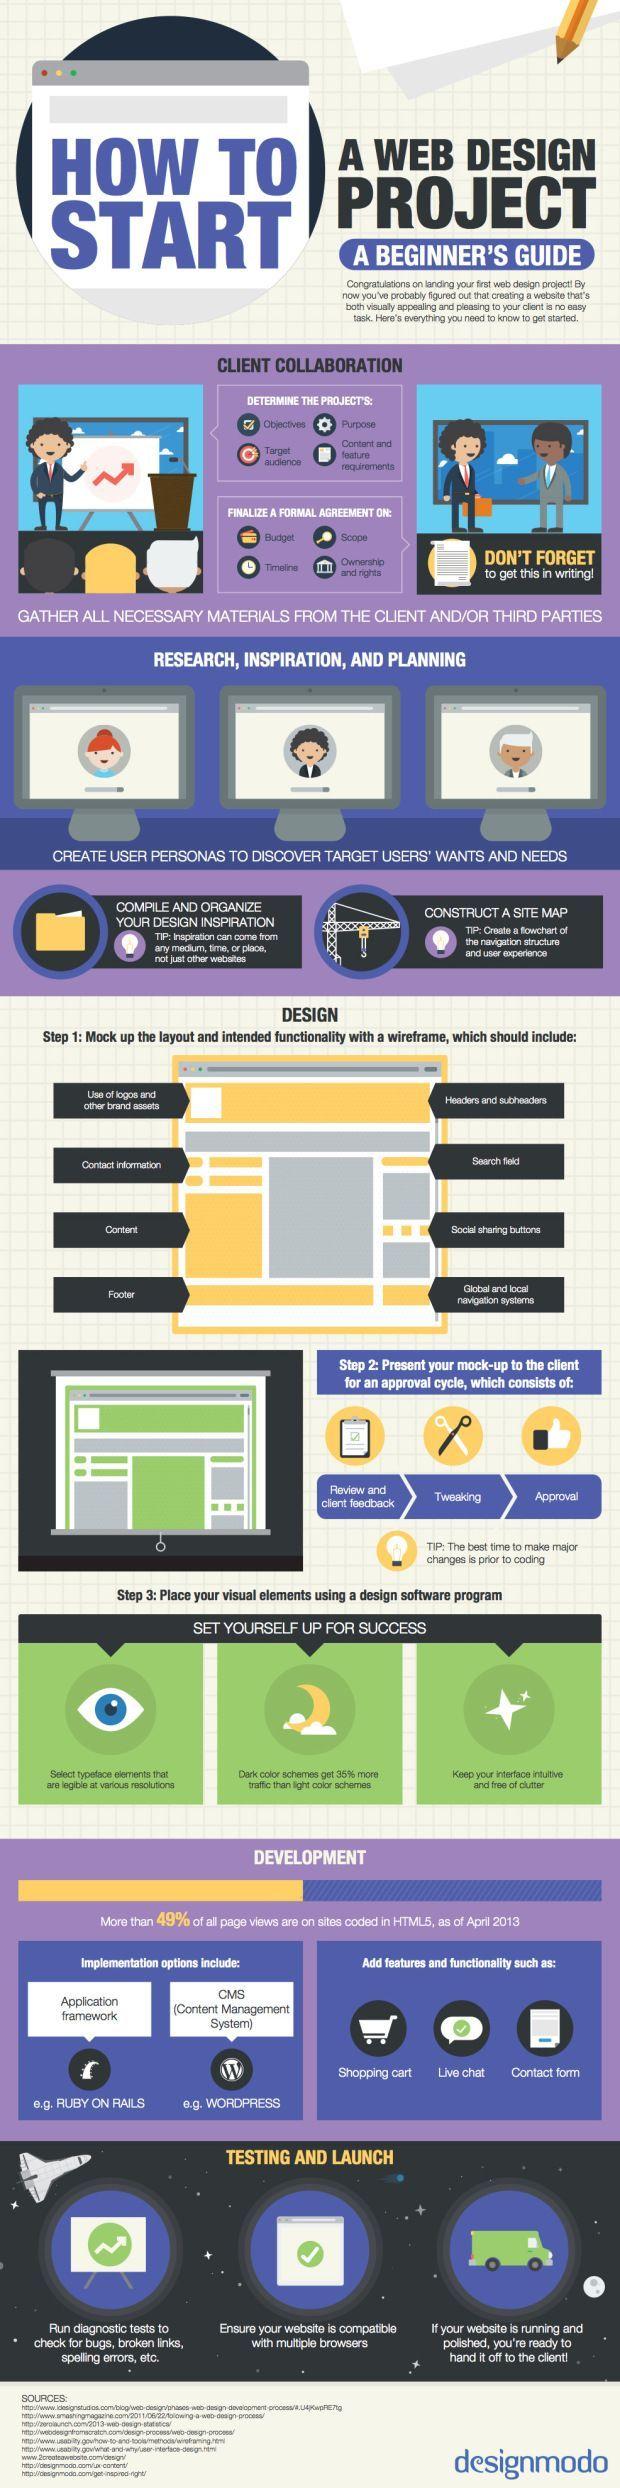 how-to-web-design